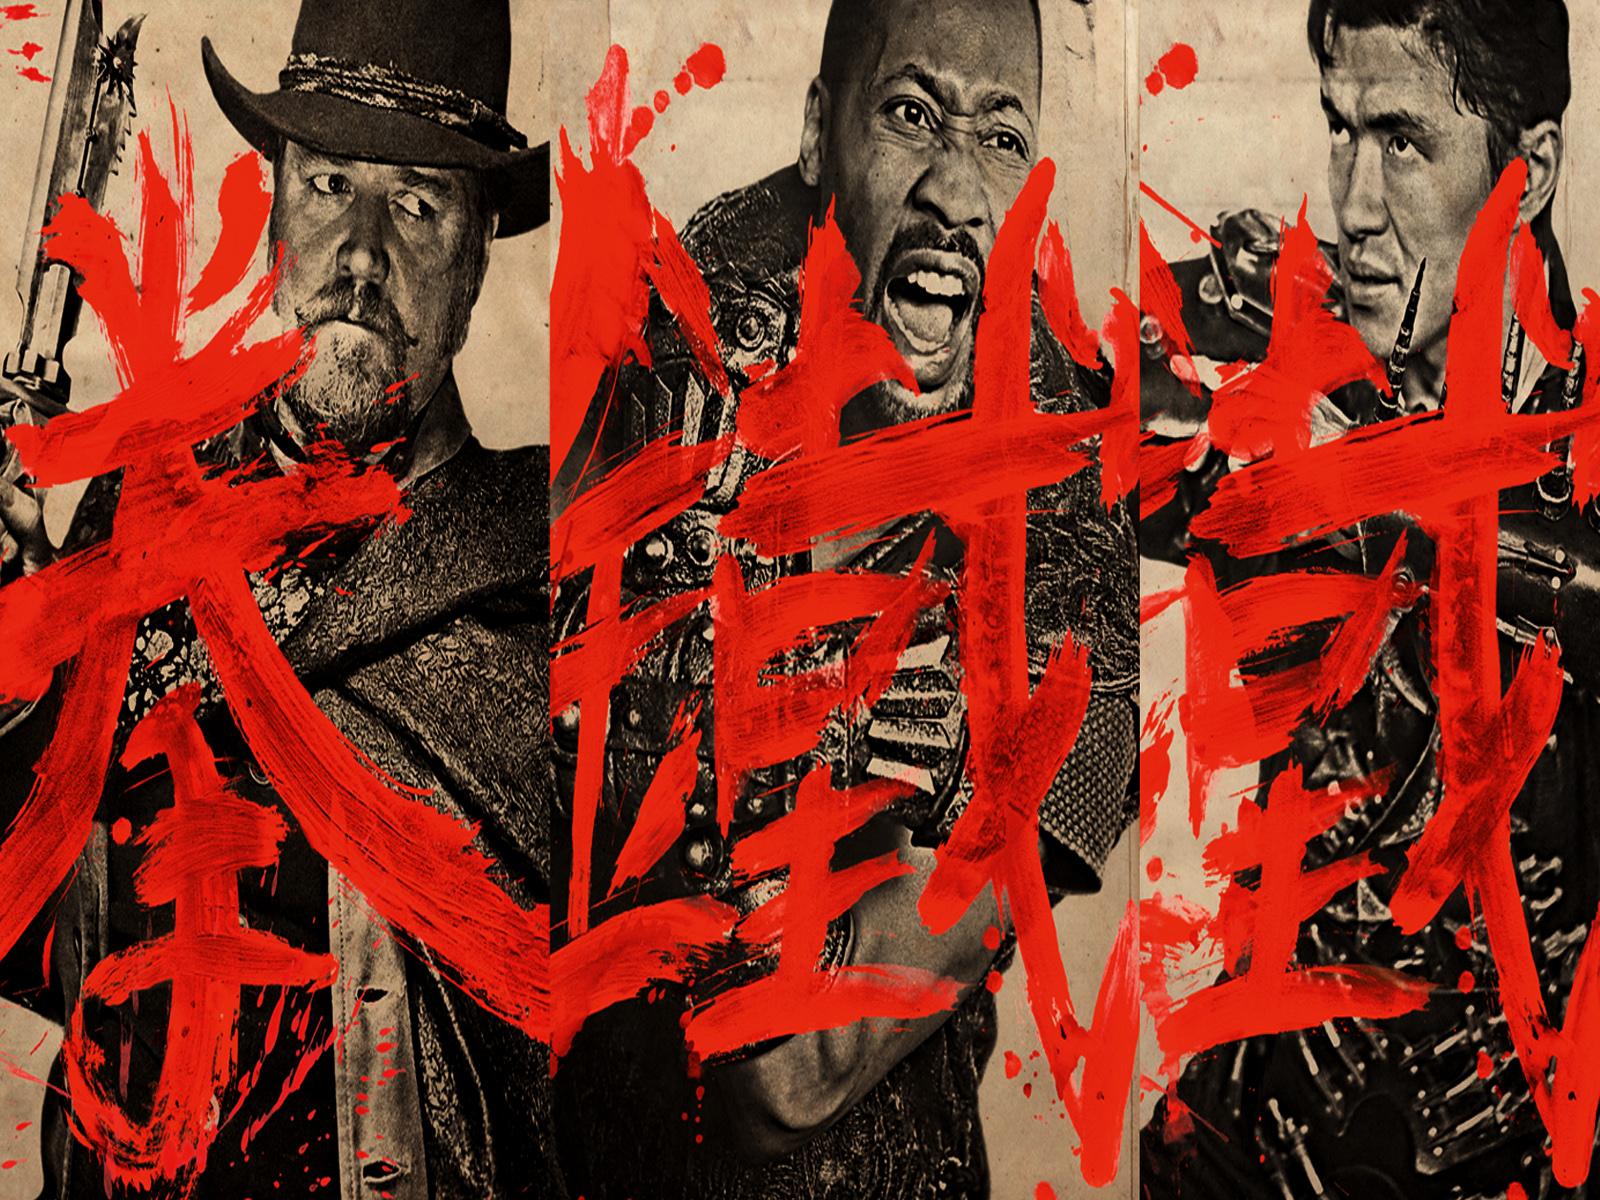 http://3.bp.blogspot.com/-SMkW2bpCJiY/UIPwFn5JMKI/AAAAAAAAFkE/F8DaSOkNPQc/s1600/Man-with-Iron-Fists-Characters-HD-Wallpaper_Vvallpaper.Net.jpg